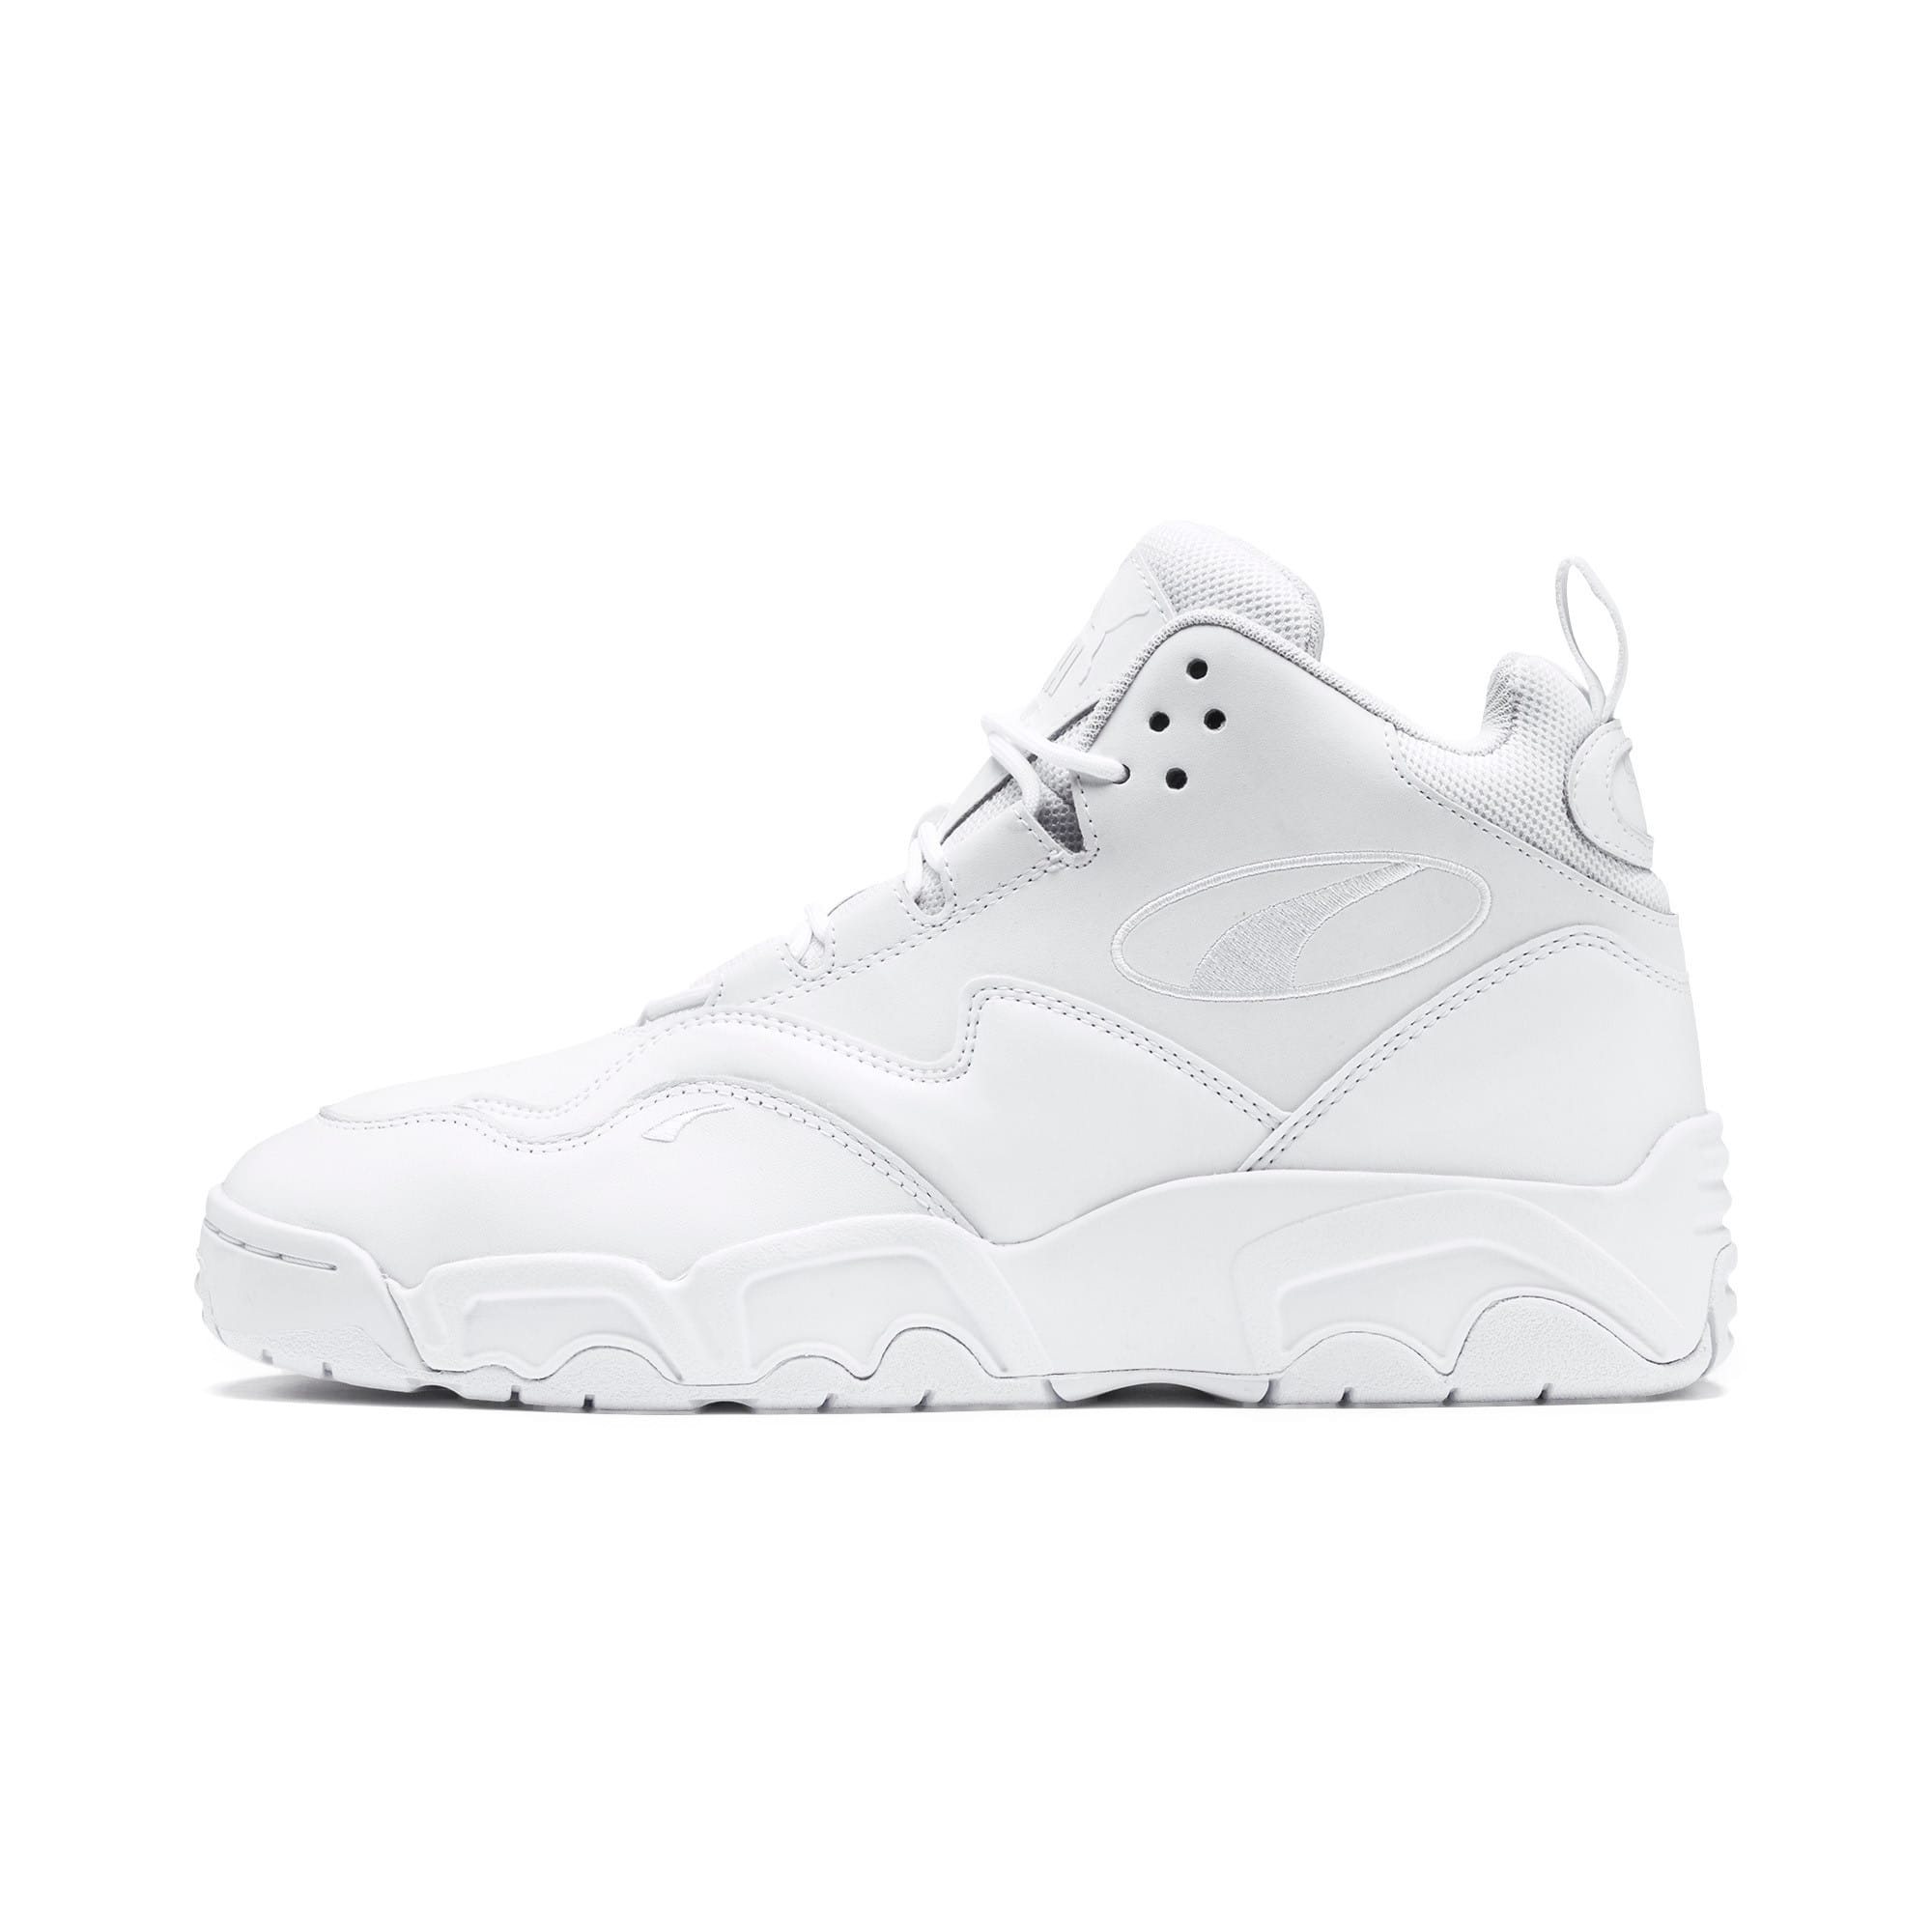 Thumbnail 1 of Source Mid Sneakers, Puma Black-Puma White, medium